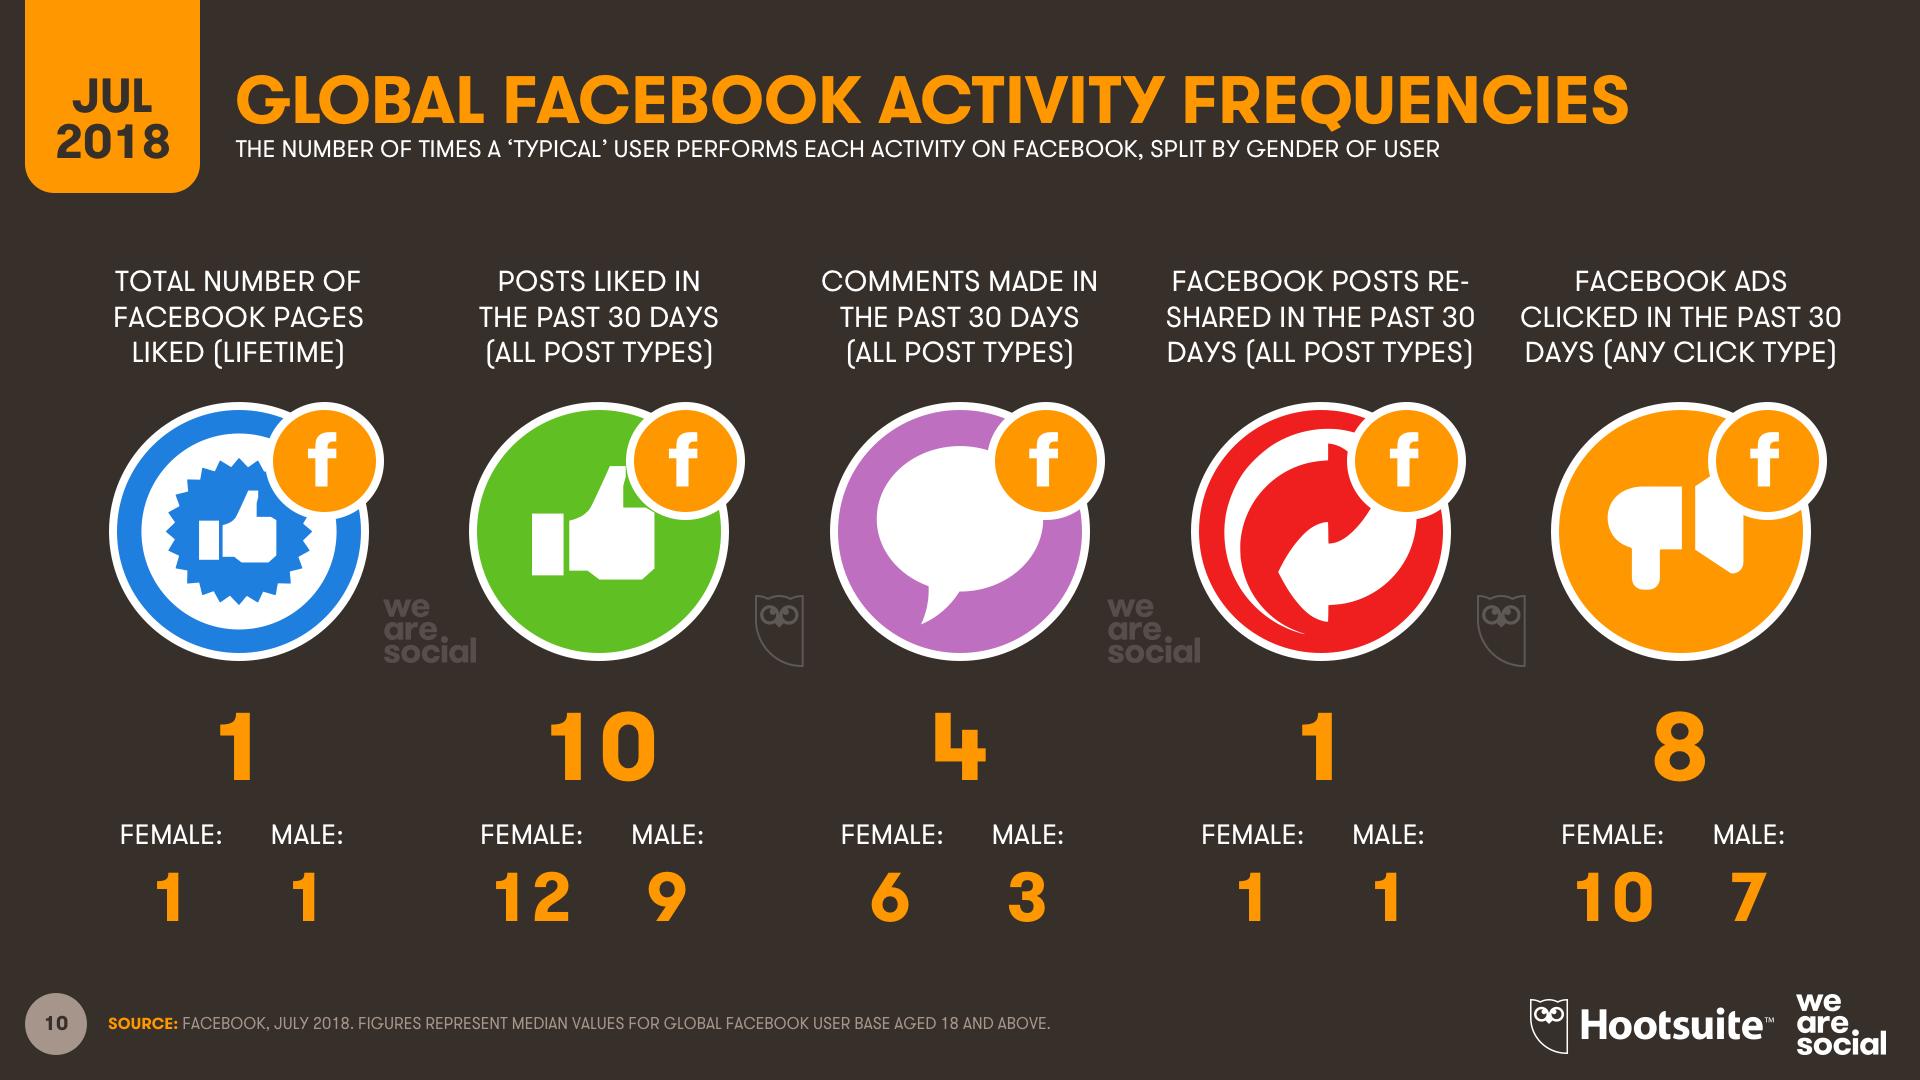 Facebook Global Activity Frequencies July 2018 DataReportal